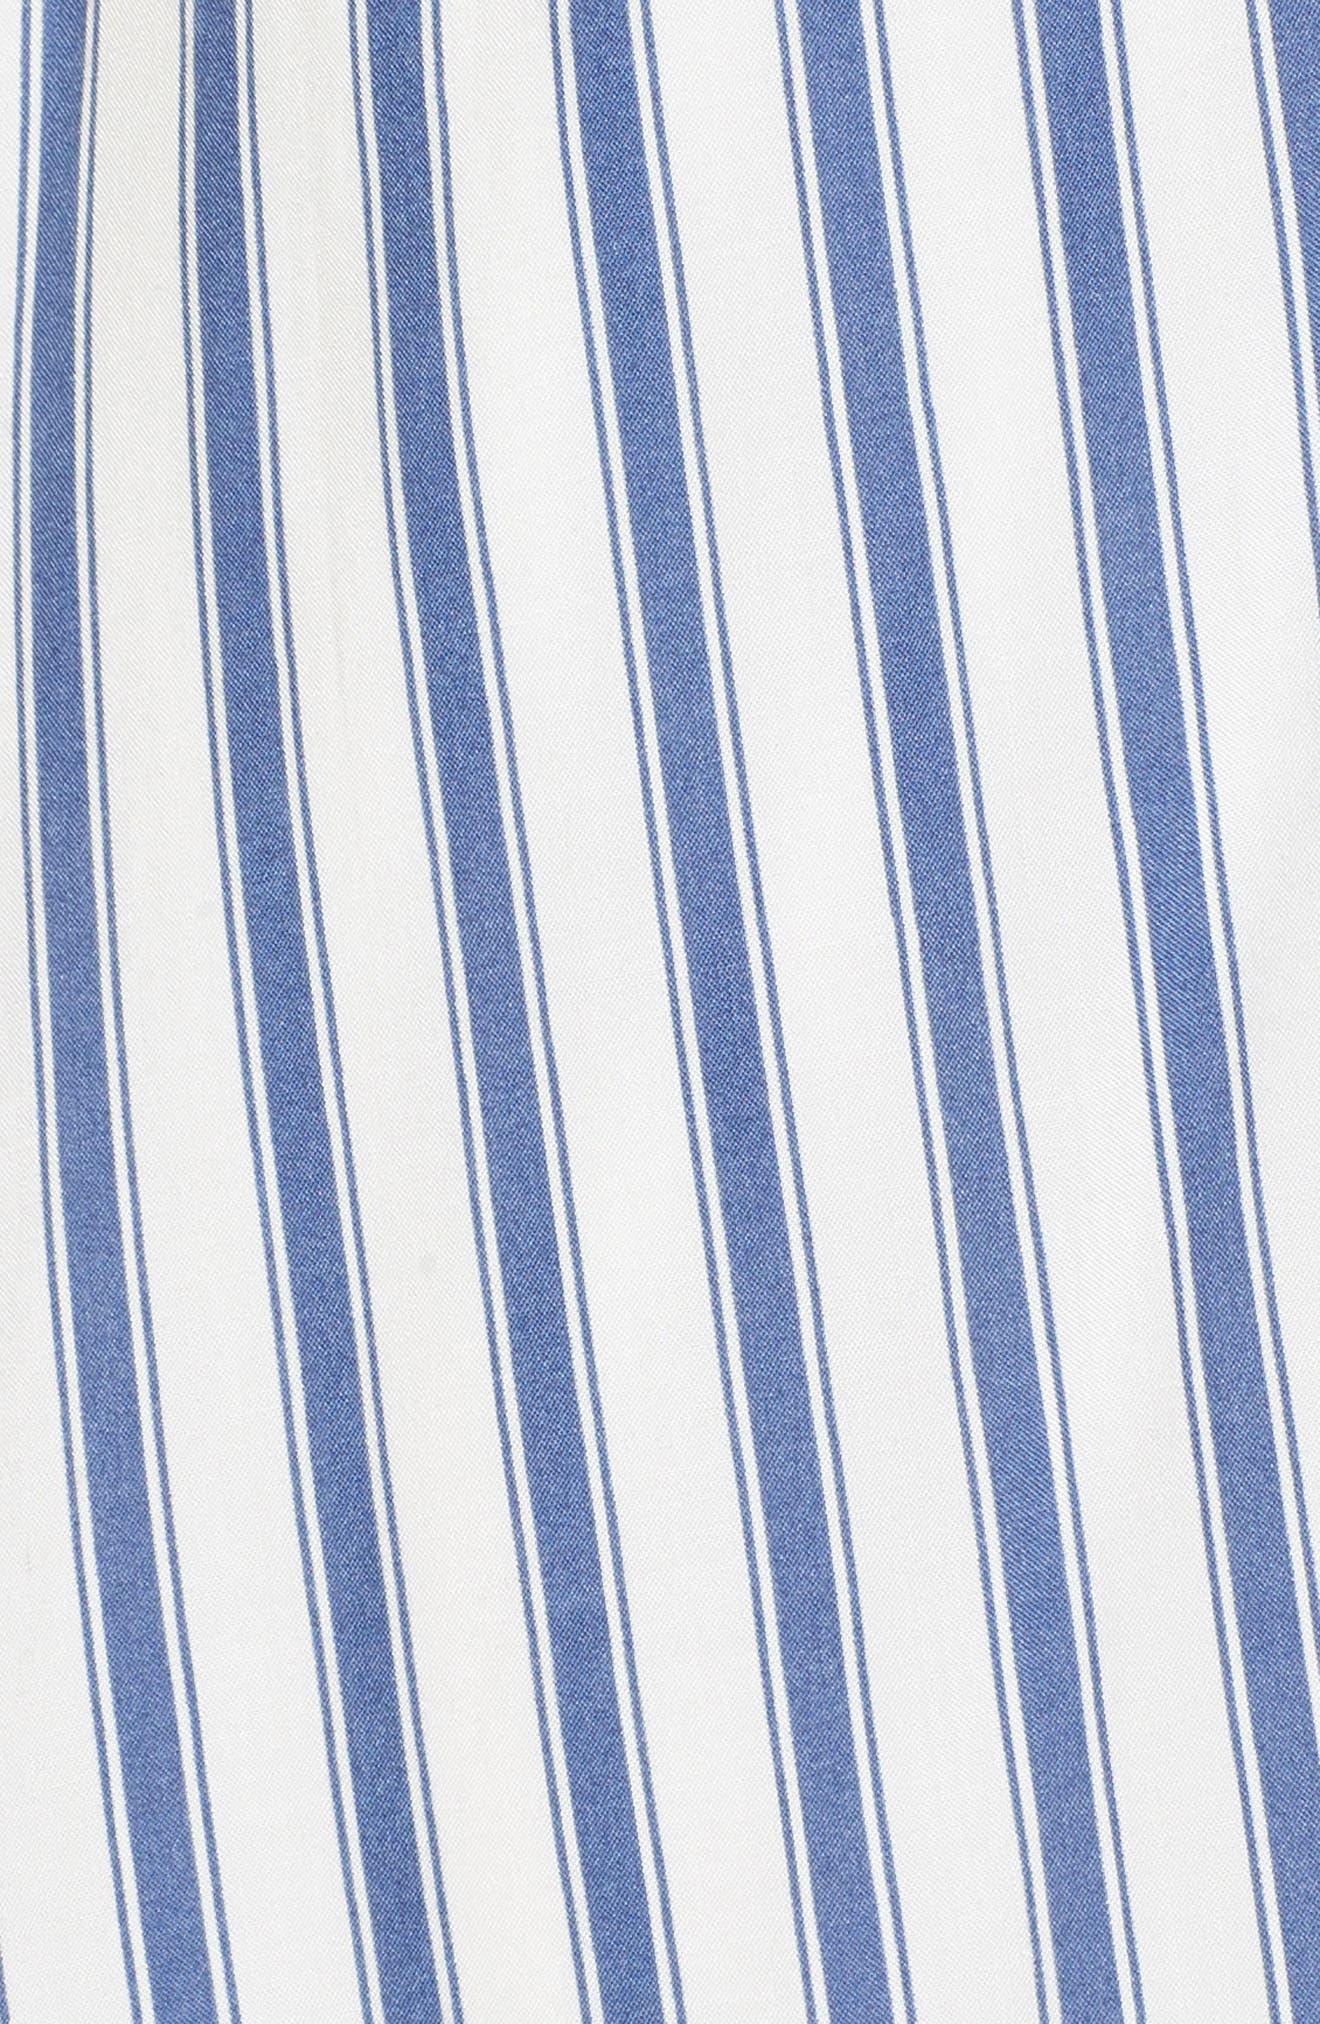 Cinch Front Minidress,                             Alternate thumbnail 5, color,                             Blue/ White Stripe